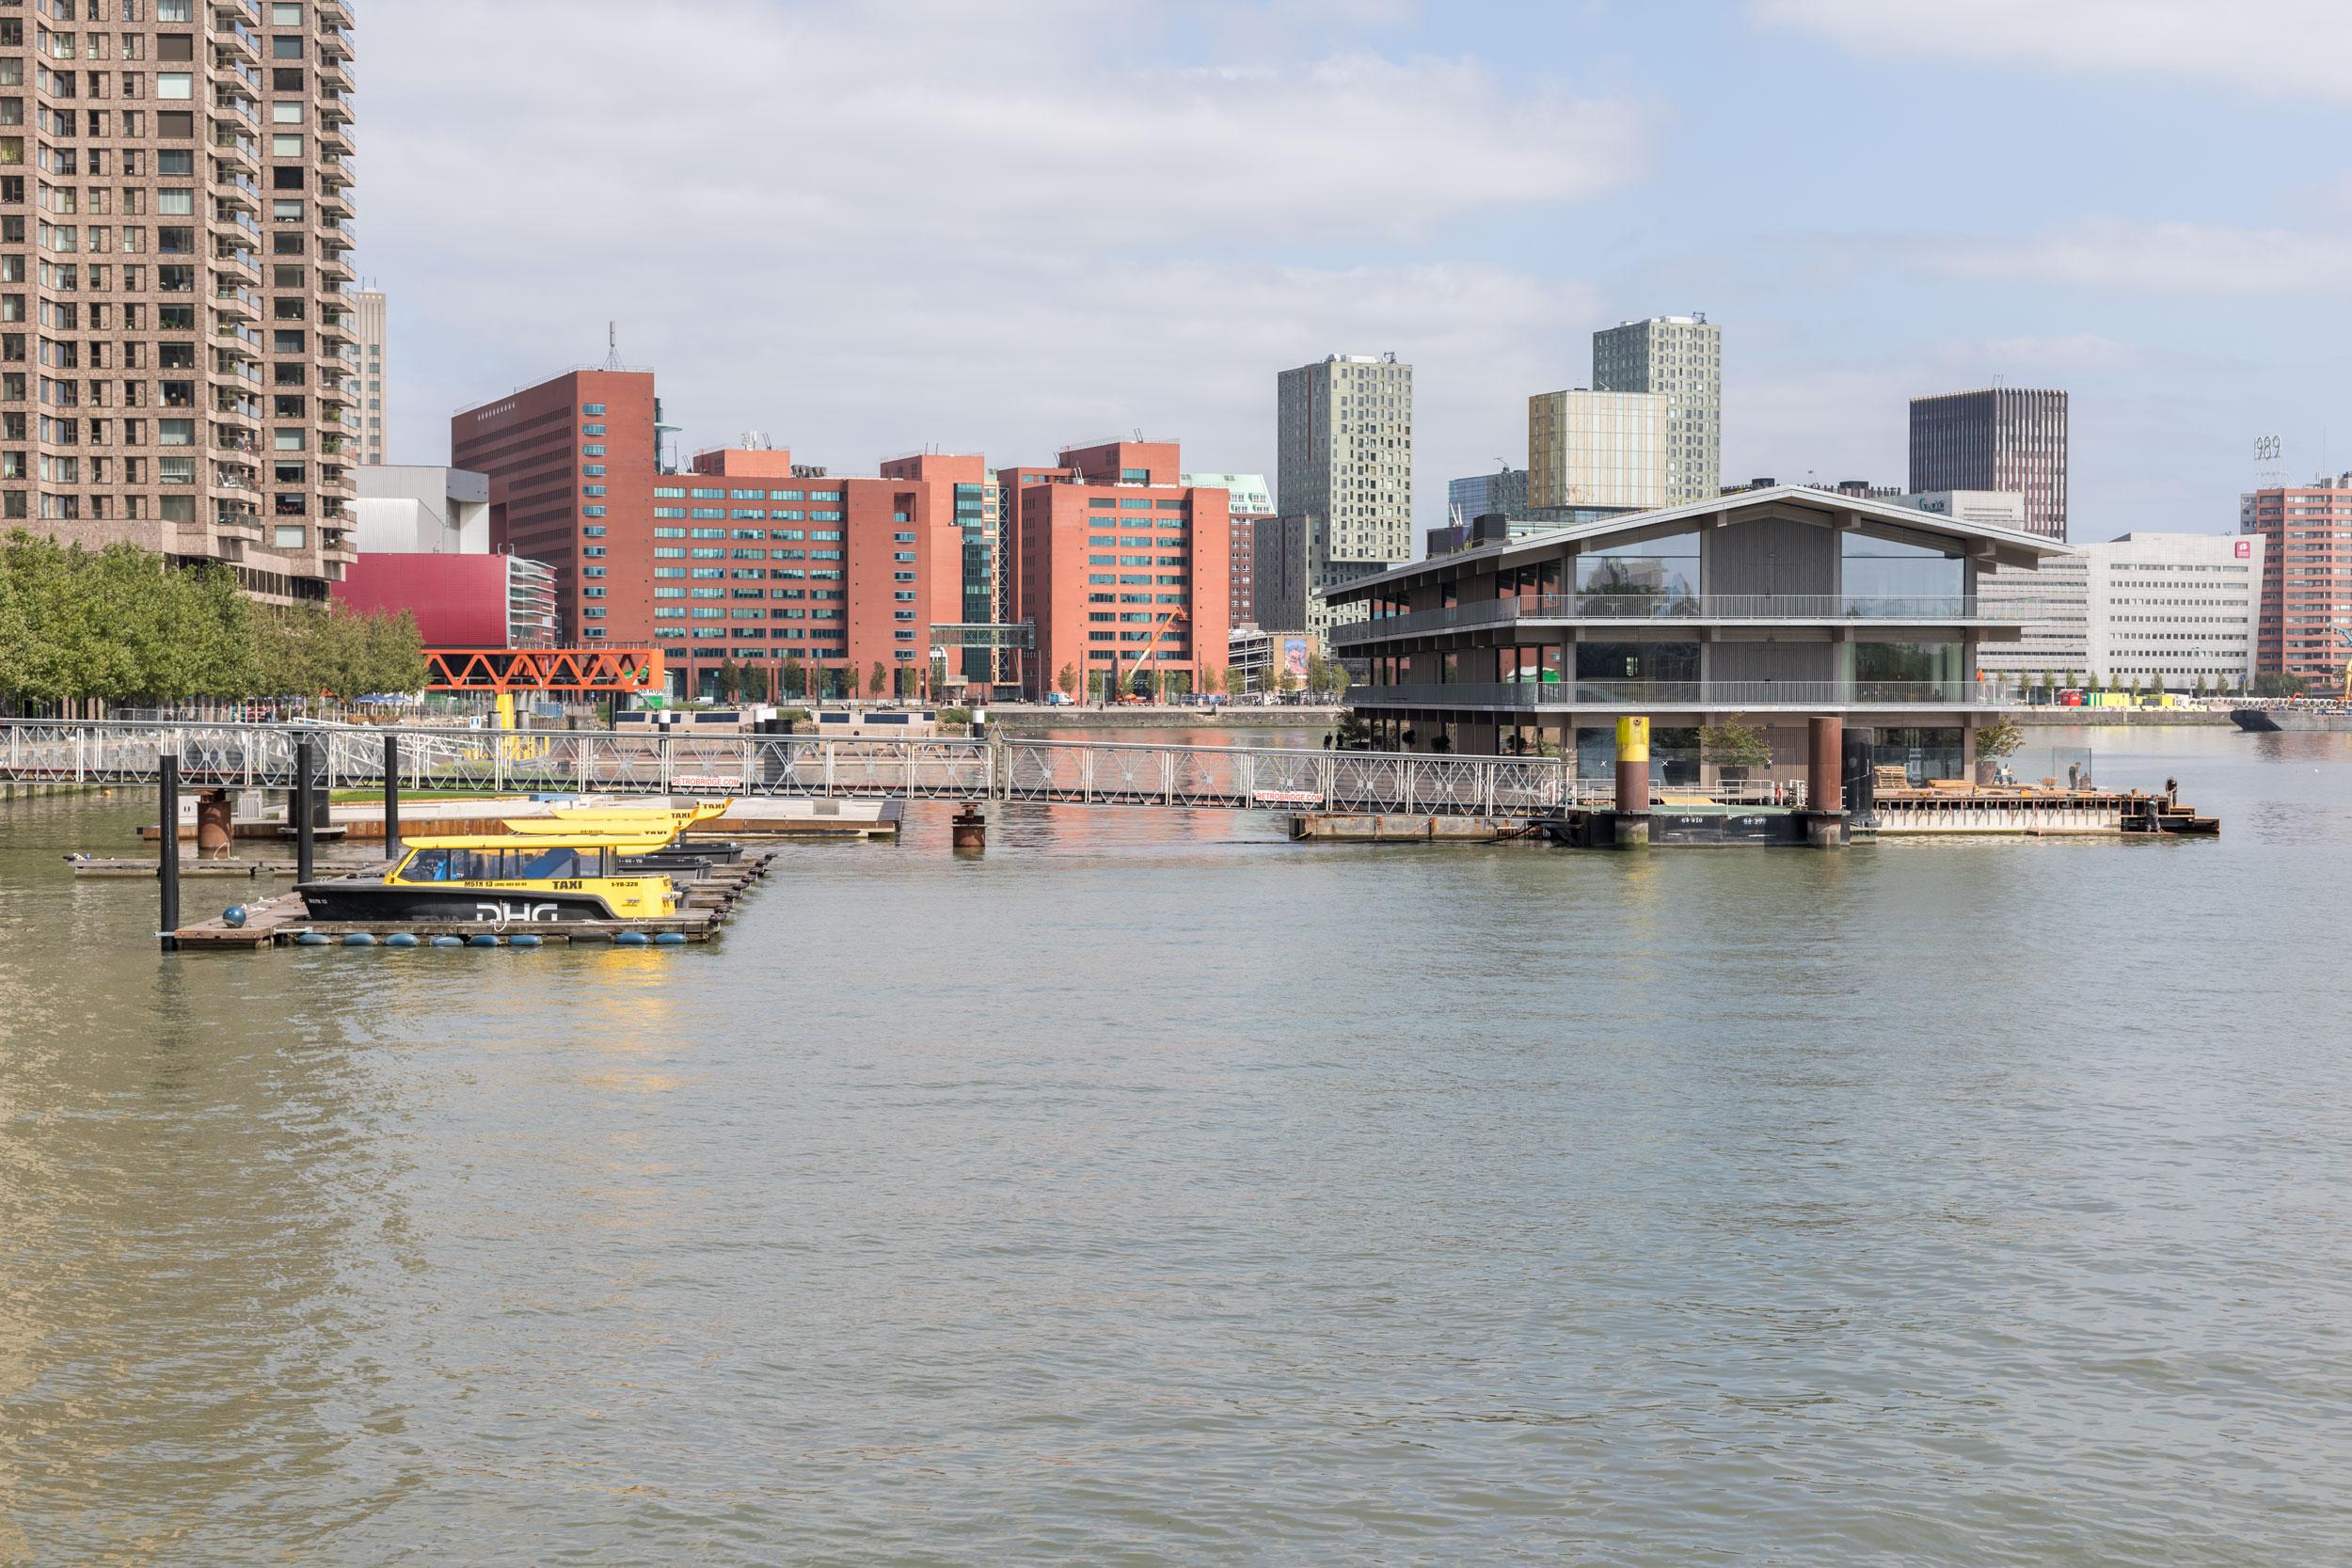 Rijnhaven_Vers Beton_Sylvana Lansu (2)